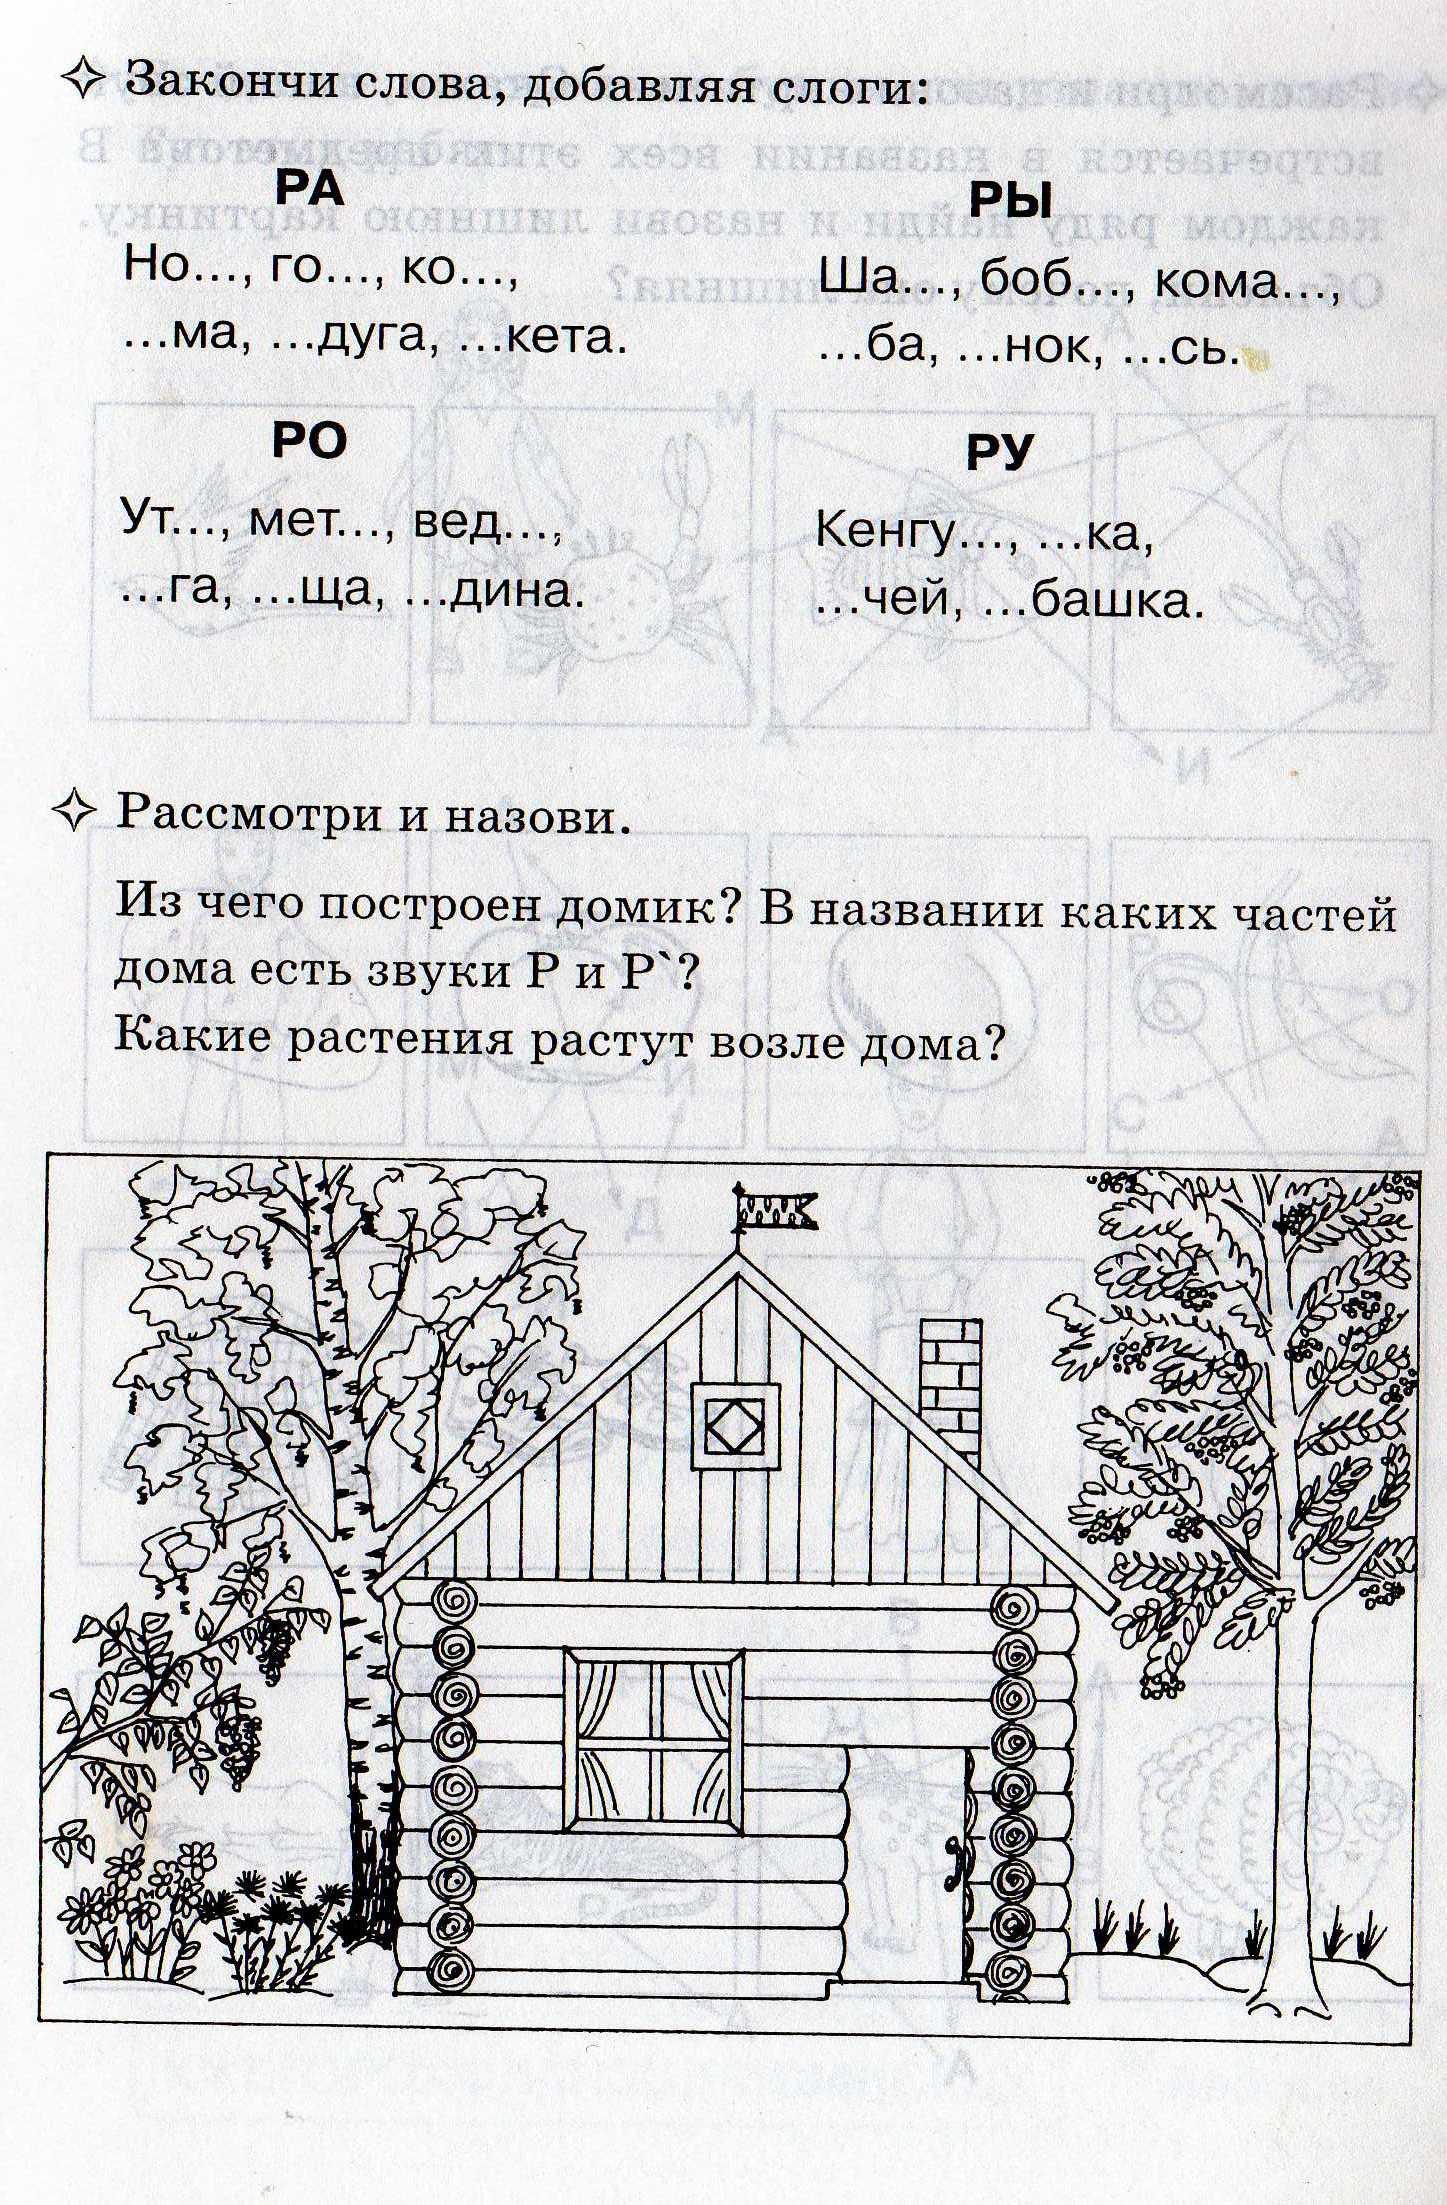 C:\Documents and Settings\Администратор\Рабочий стол\img147.jpg